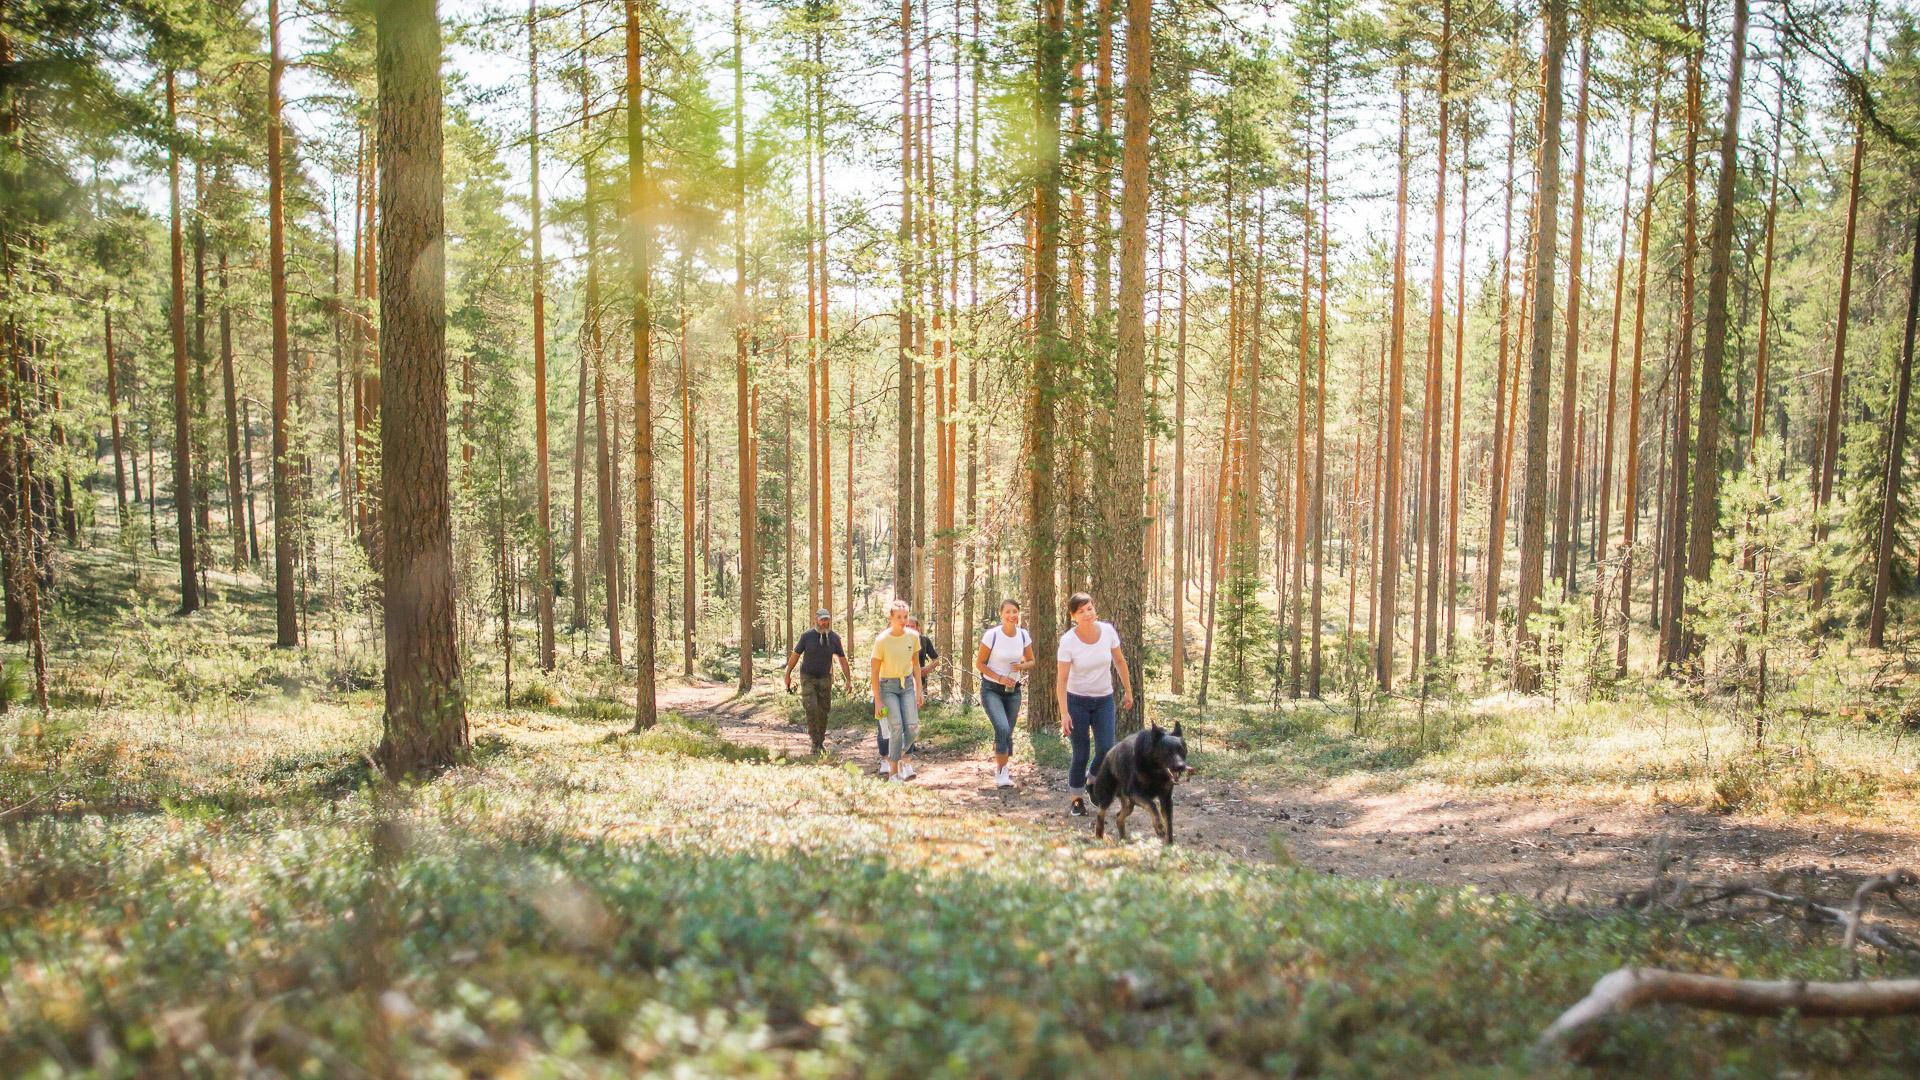 Visit Tampere Korsuretket Patikointi Hiking Forest Nature Laura Vanzo 27